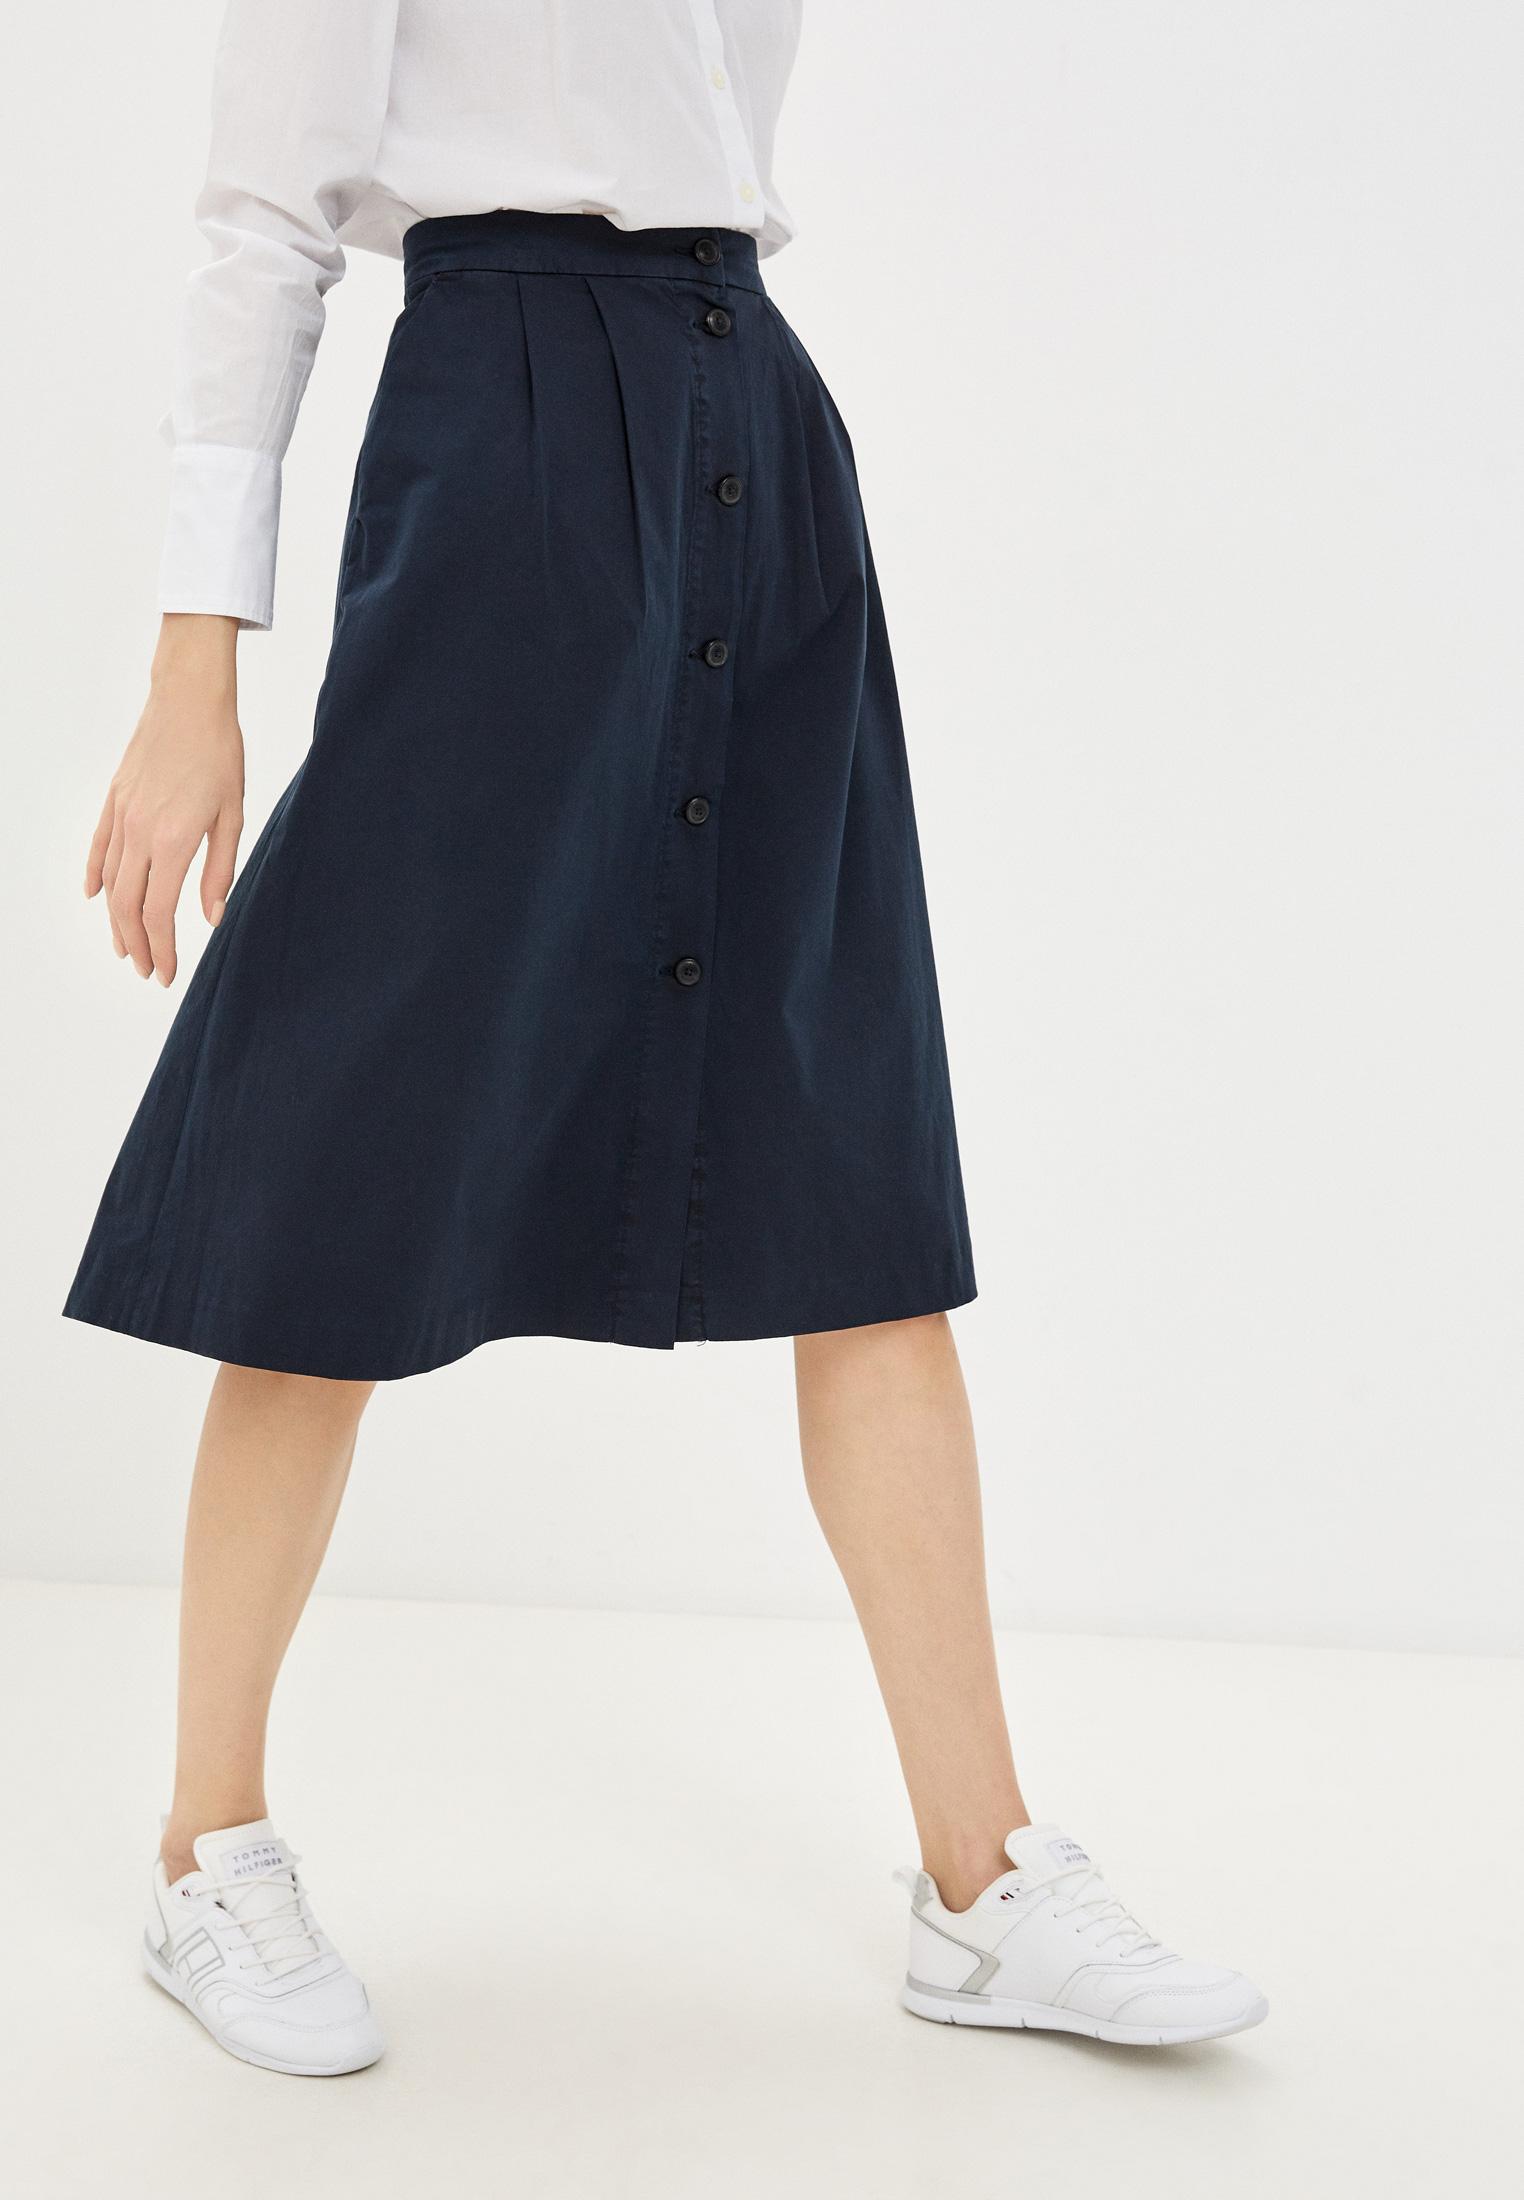 Широкая юбка Tommy Hilfiger (Томми Хилфигер) Юбка Tommy Hilfiger